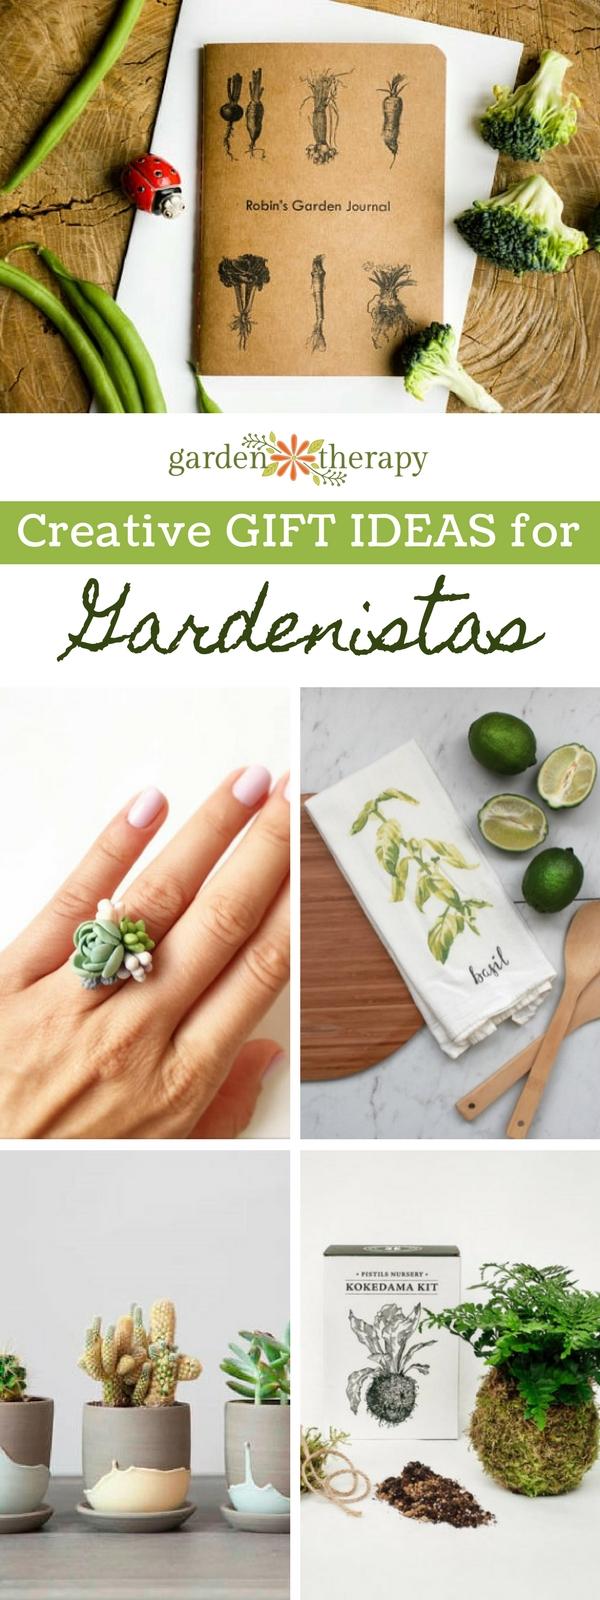 Garden-Inspired Gifts